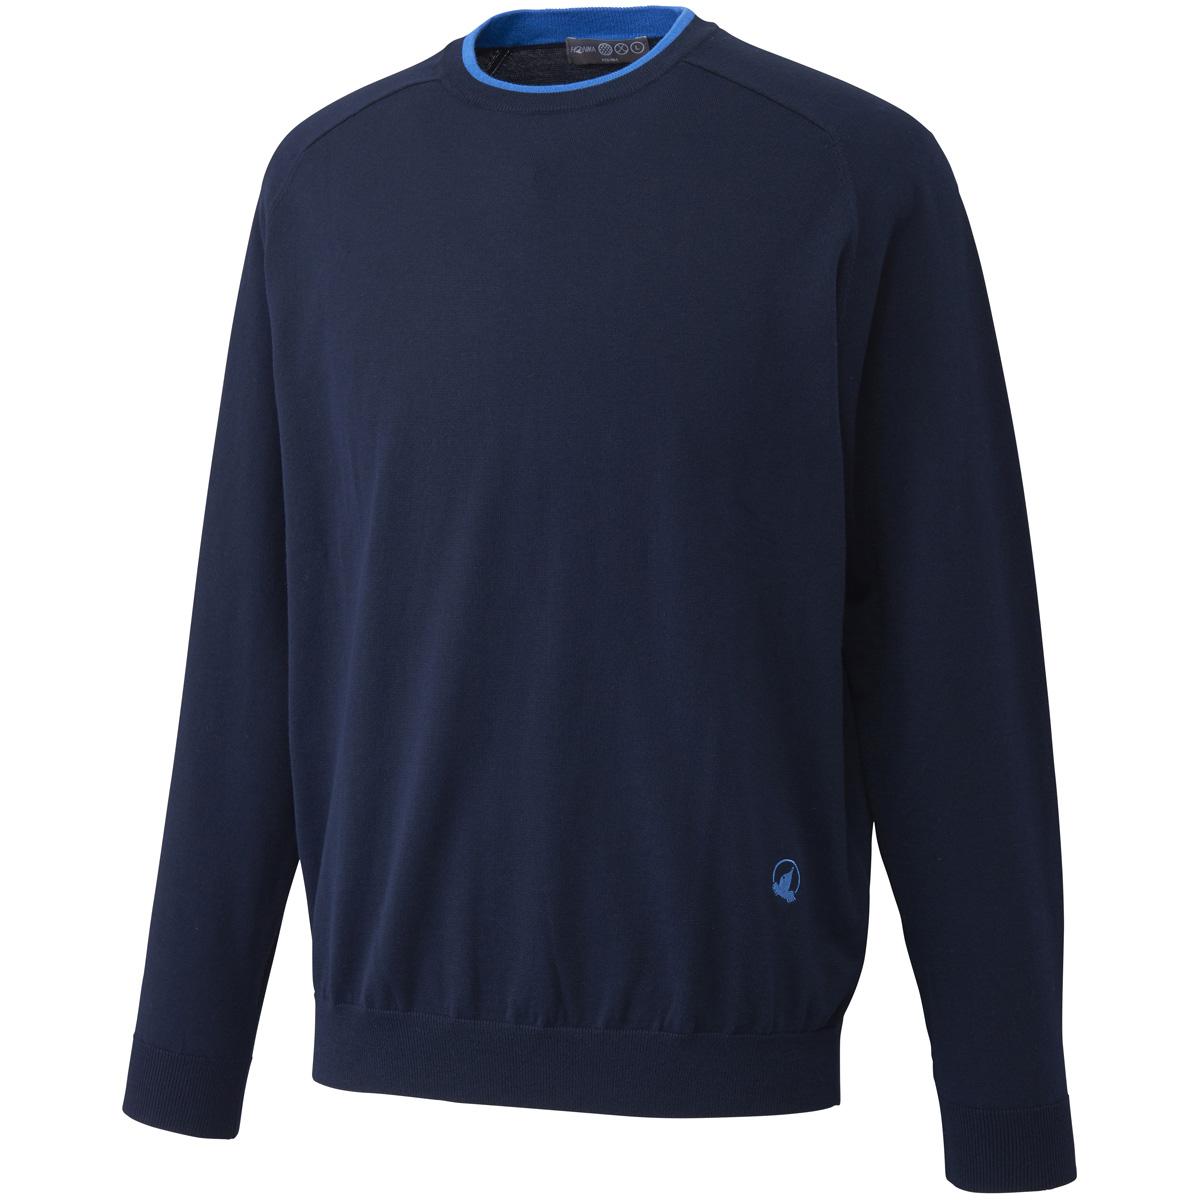 TOWN&TURF LINE 長袖セーター